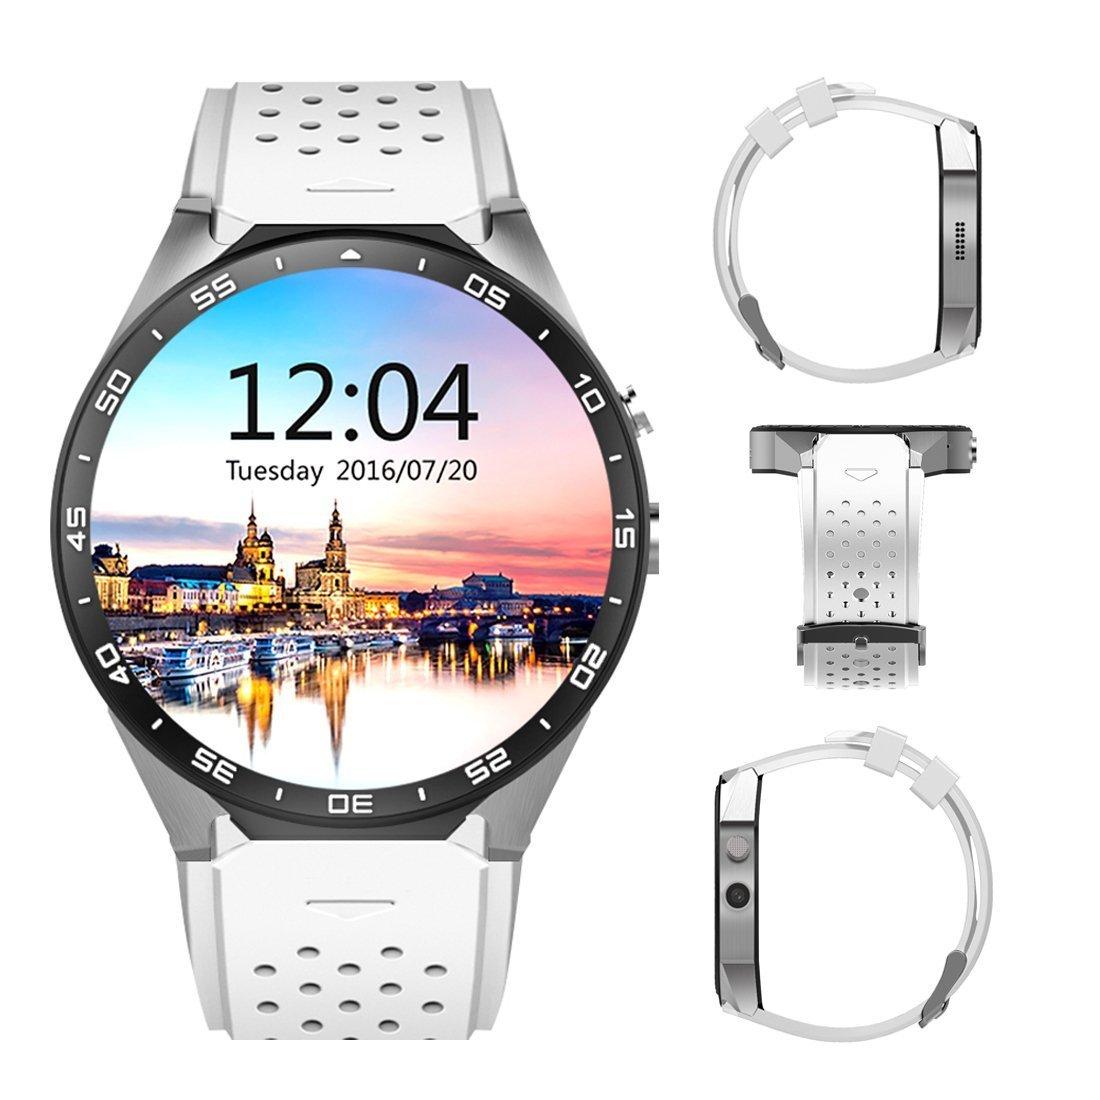 Reloj Inteligente 3G, teléfono Celular Bluetooth Todo en uno Reloj Inteligente Android 5.1 OS, cámara cuádruple de 2.0MP Bluetooth Tarjeta SIM WiFi ...